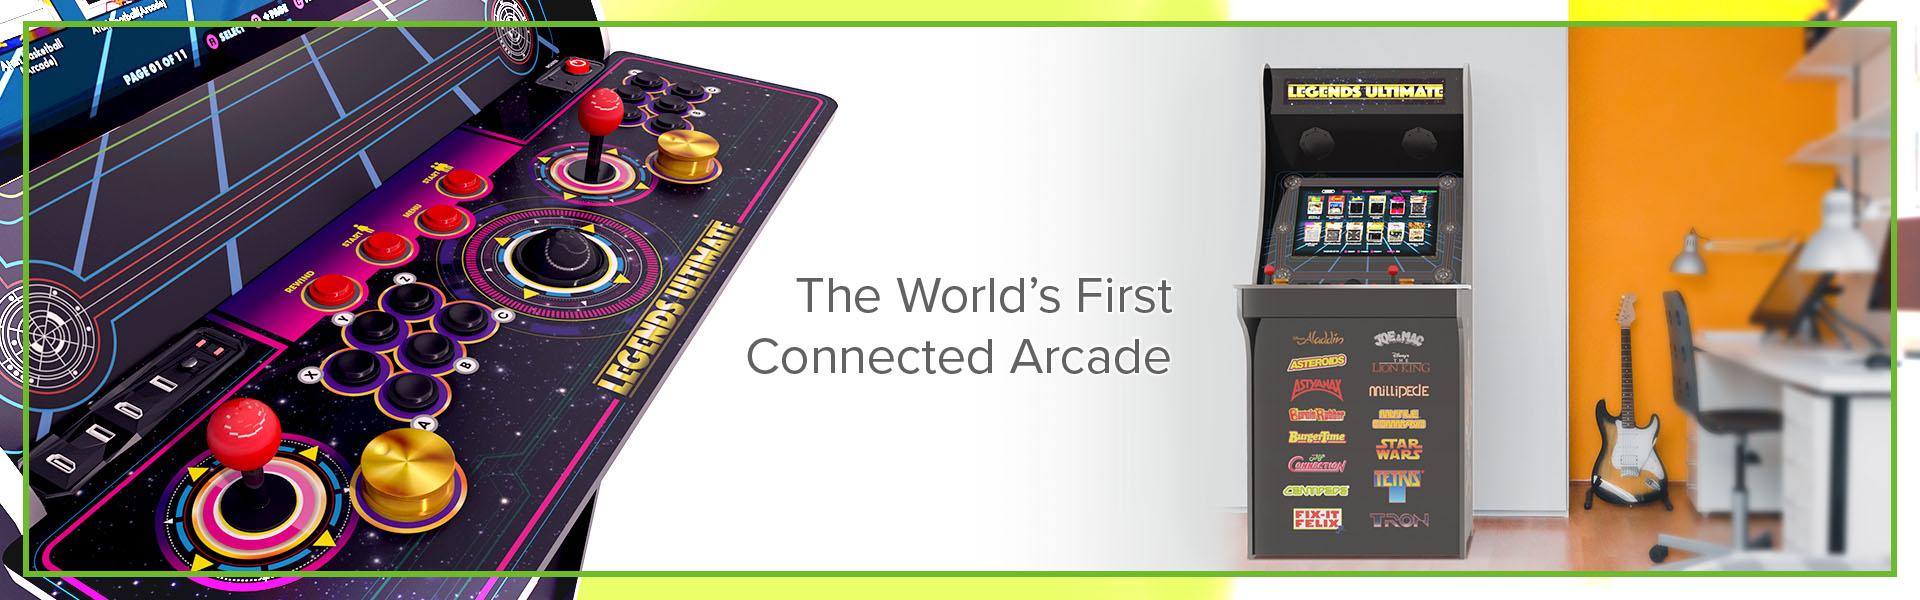 atgames arcadenet